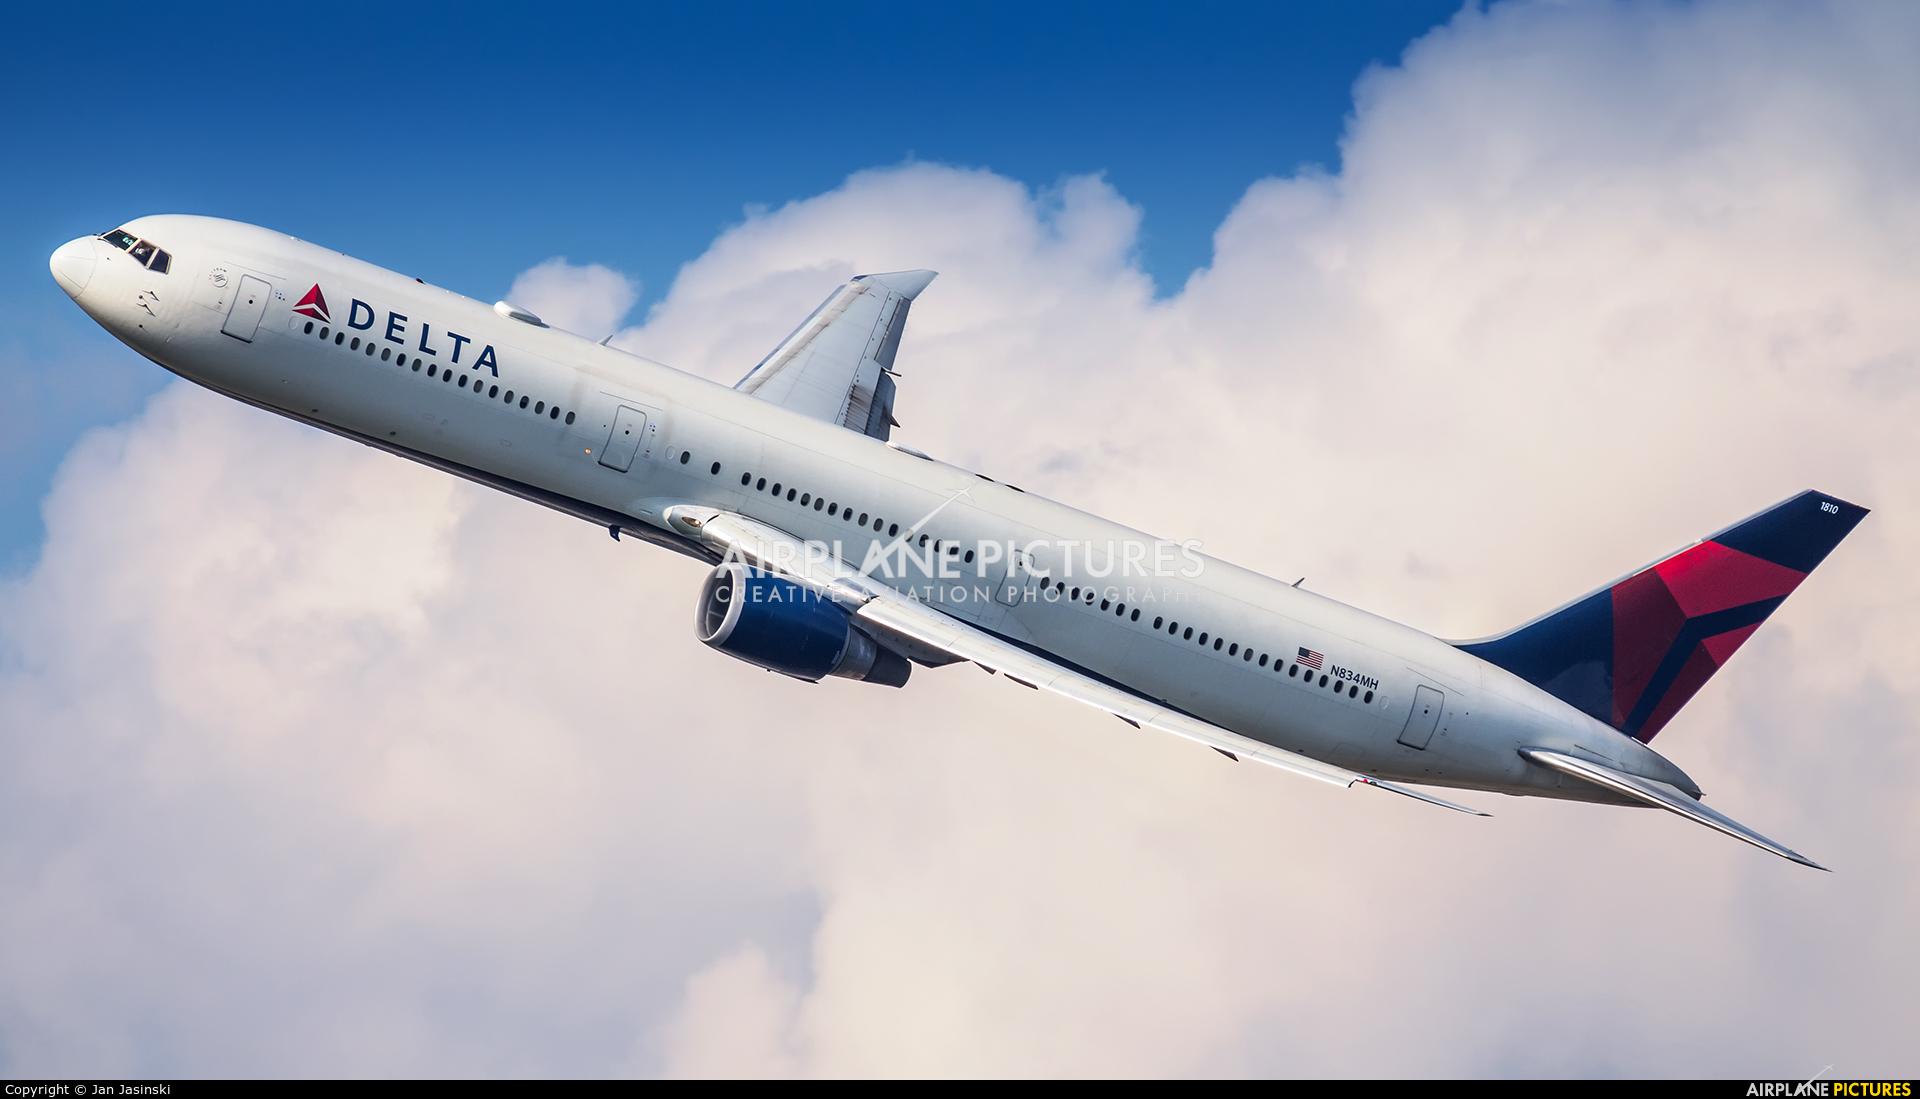 Delta Air Lines N834MH aircraft at New York - John F. Kennedy Intl